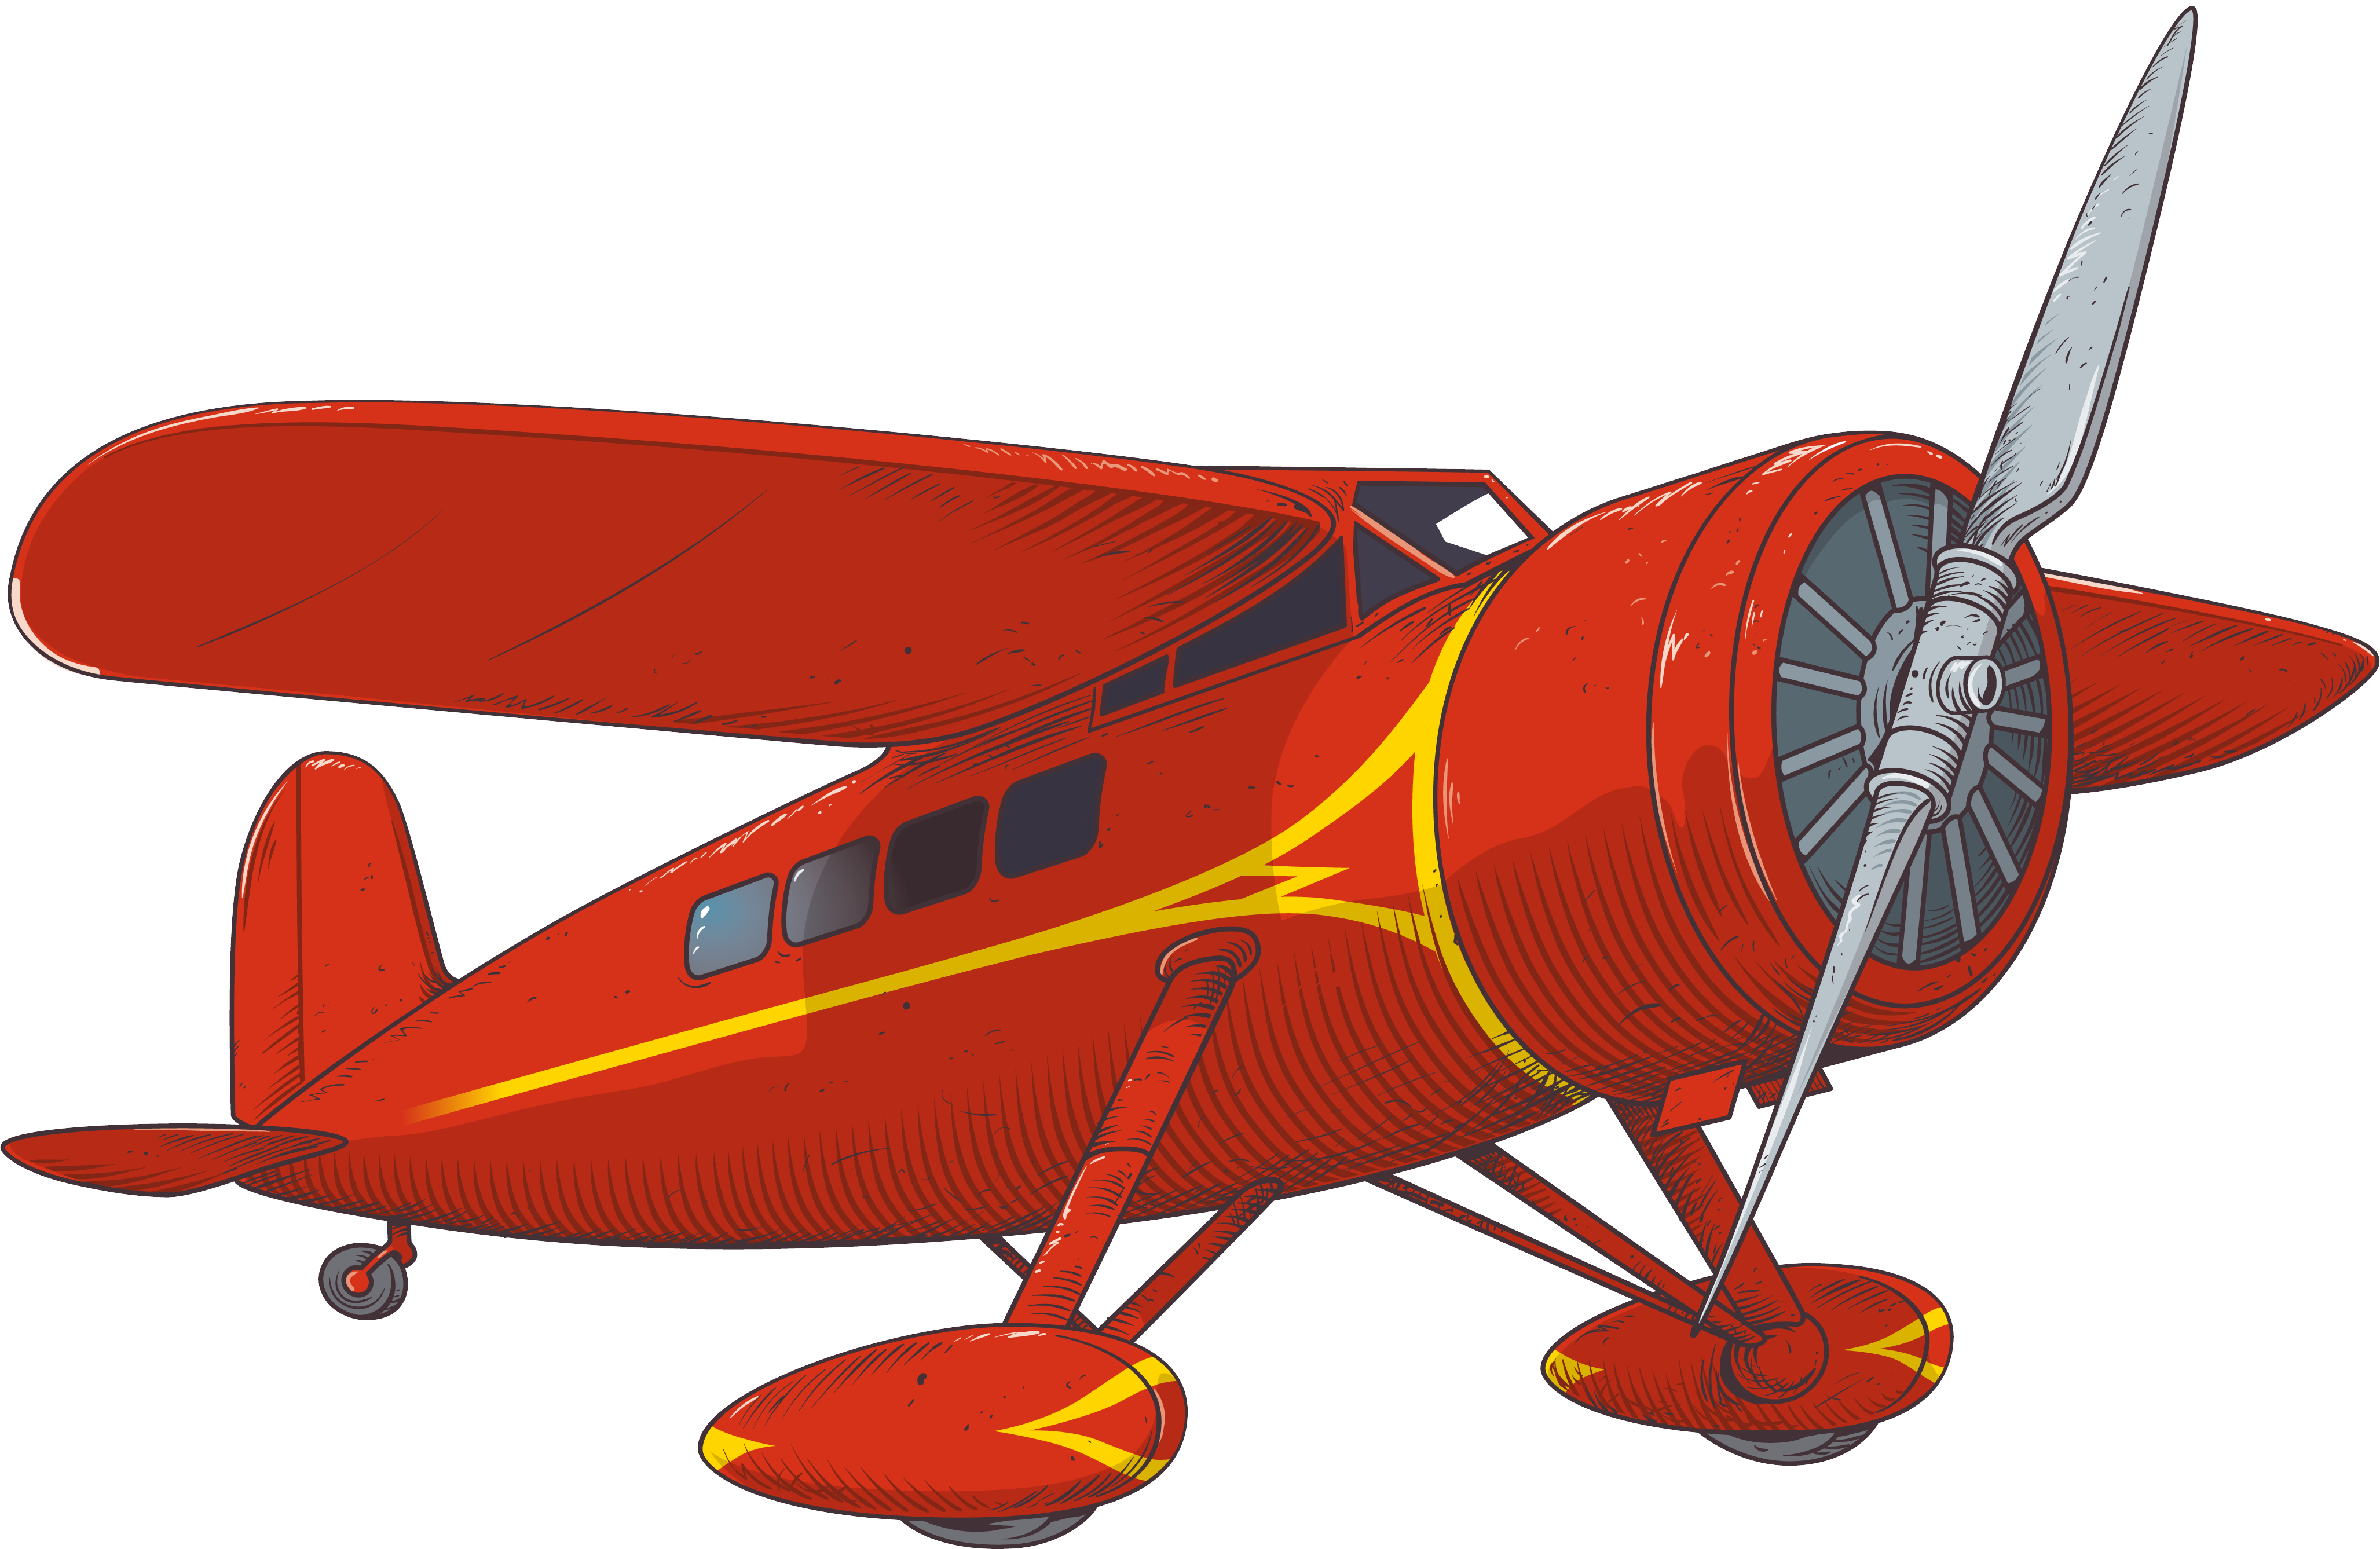 Avocado at getdrawings com. Steampunk clipart aviation